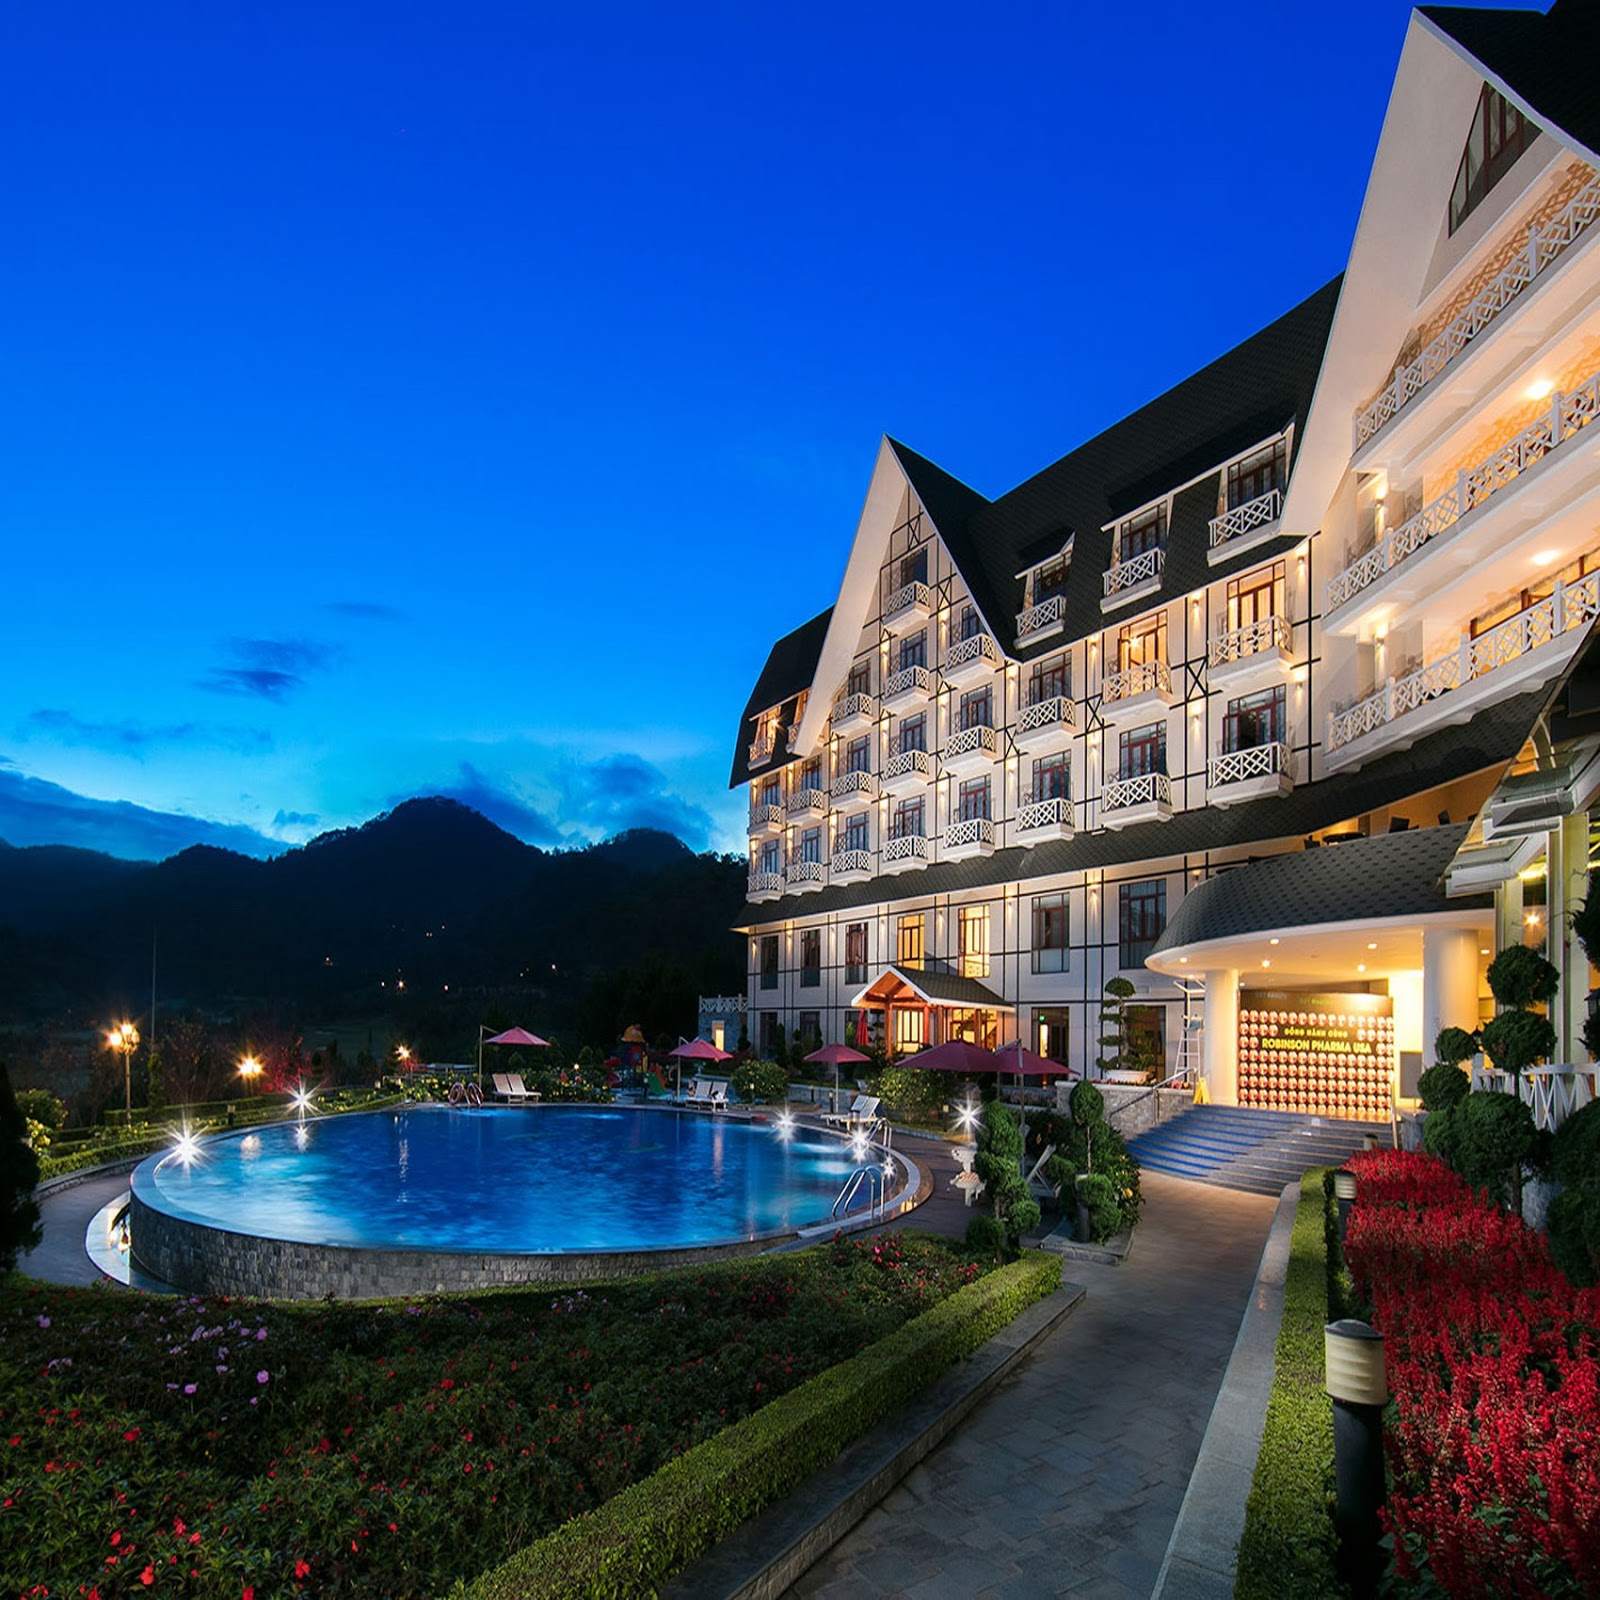 Swiss- Belresort Hotel